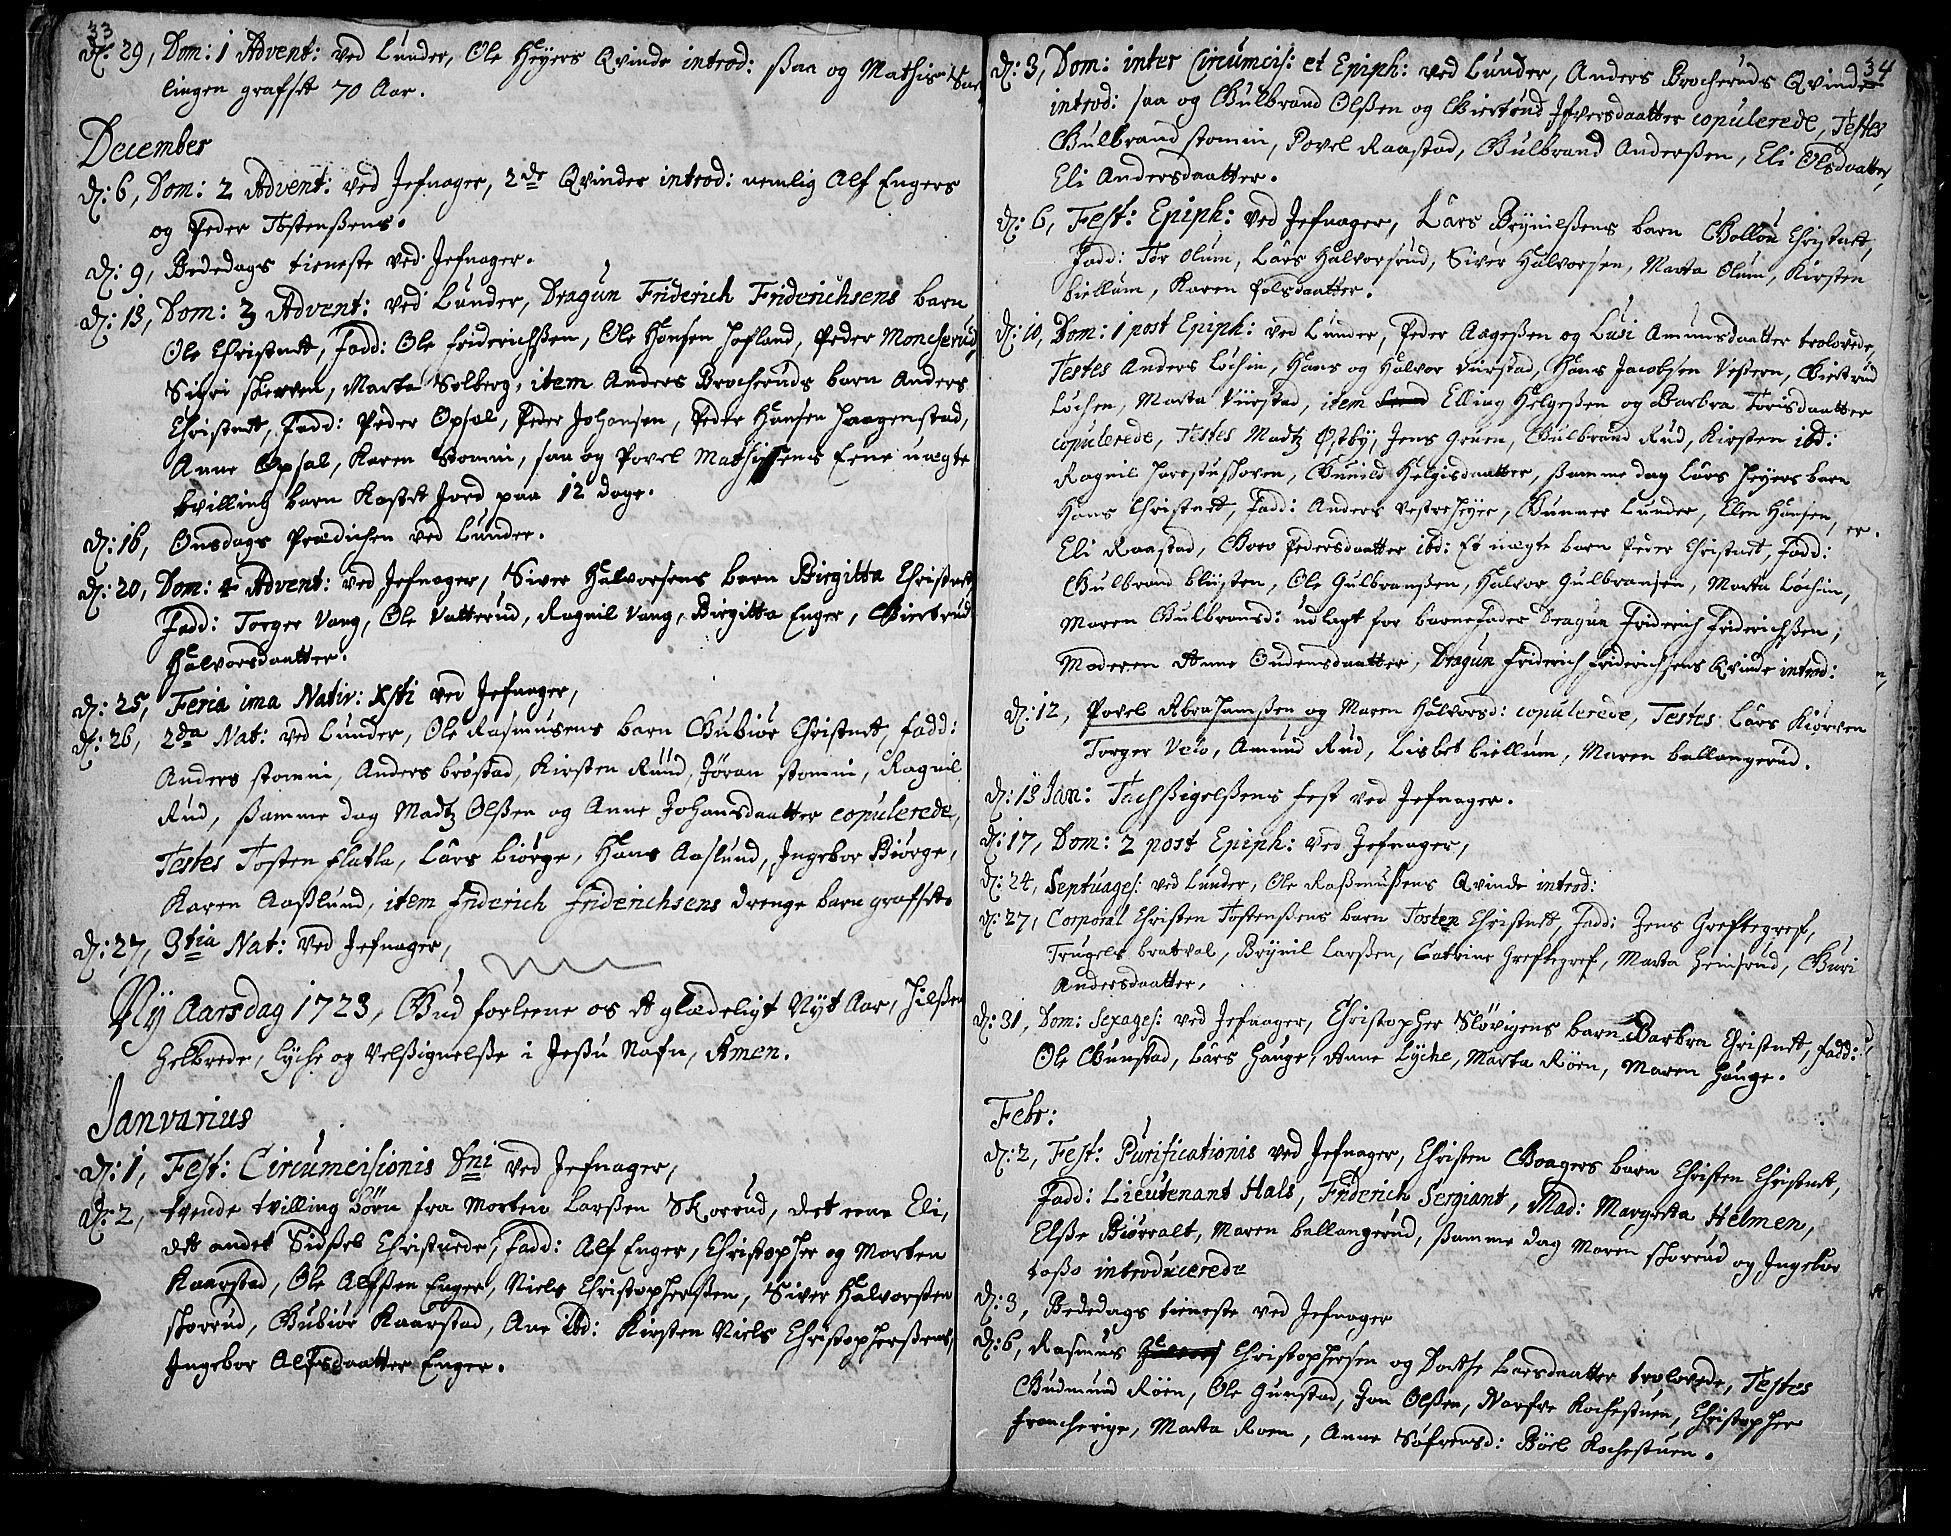 SAH, Jevnaker prestekontor, Ministerialbok nr. 1, 1718-1725, s. 33-34